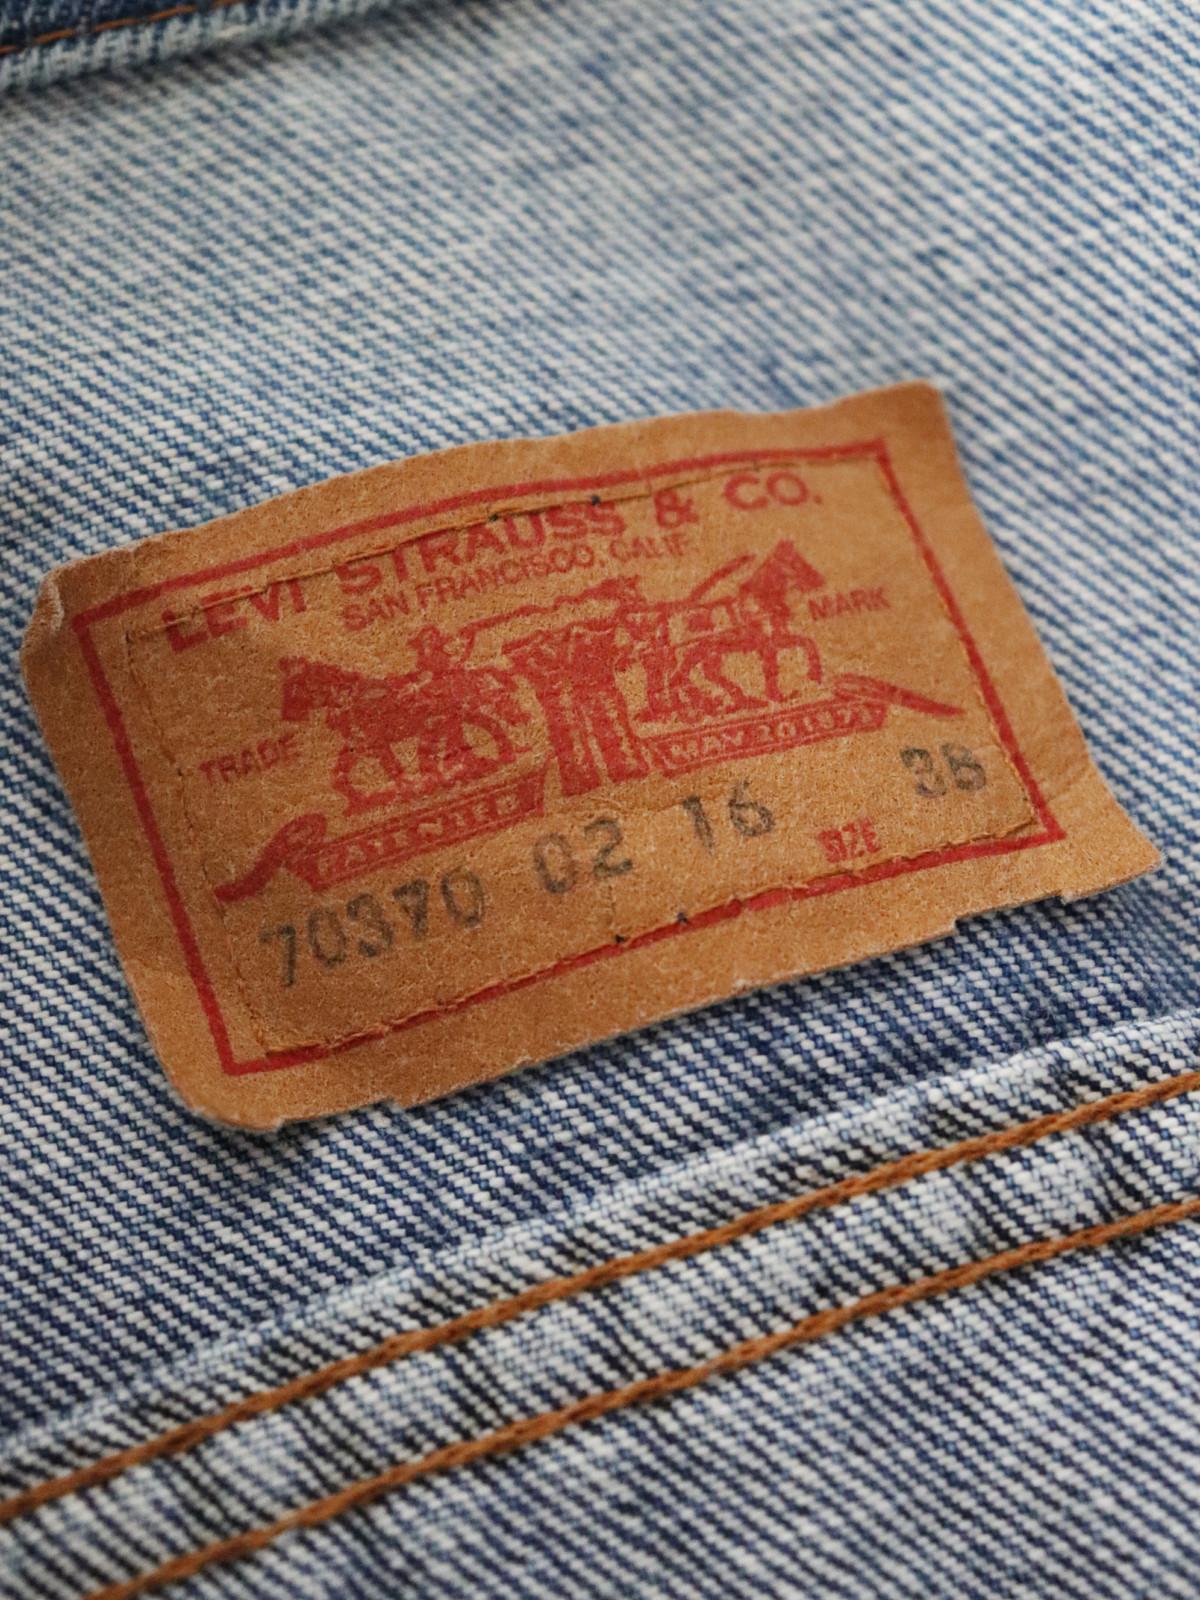 Levis',denim jacket, USA